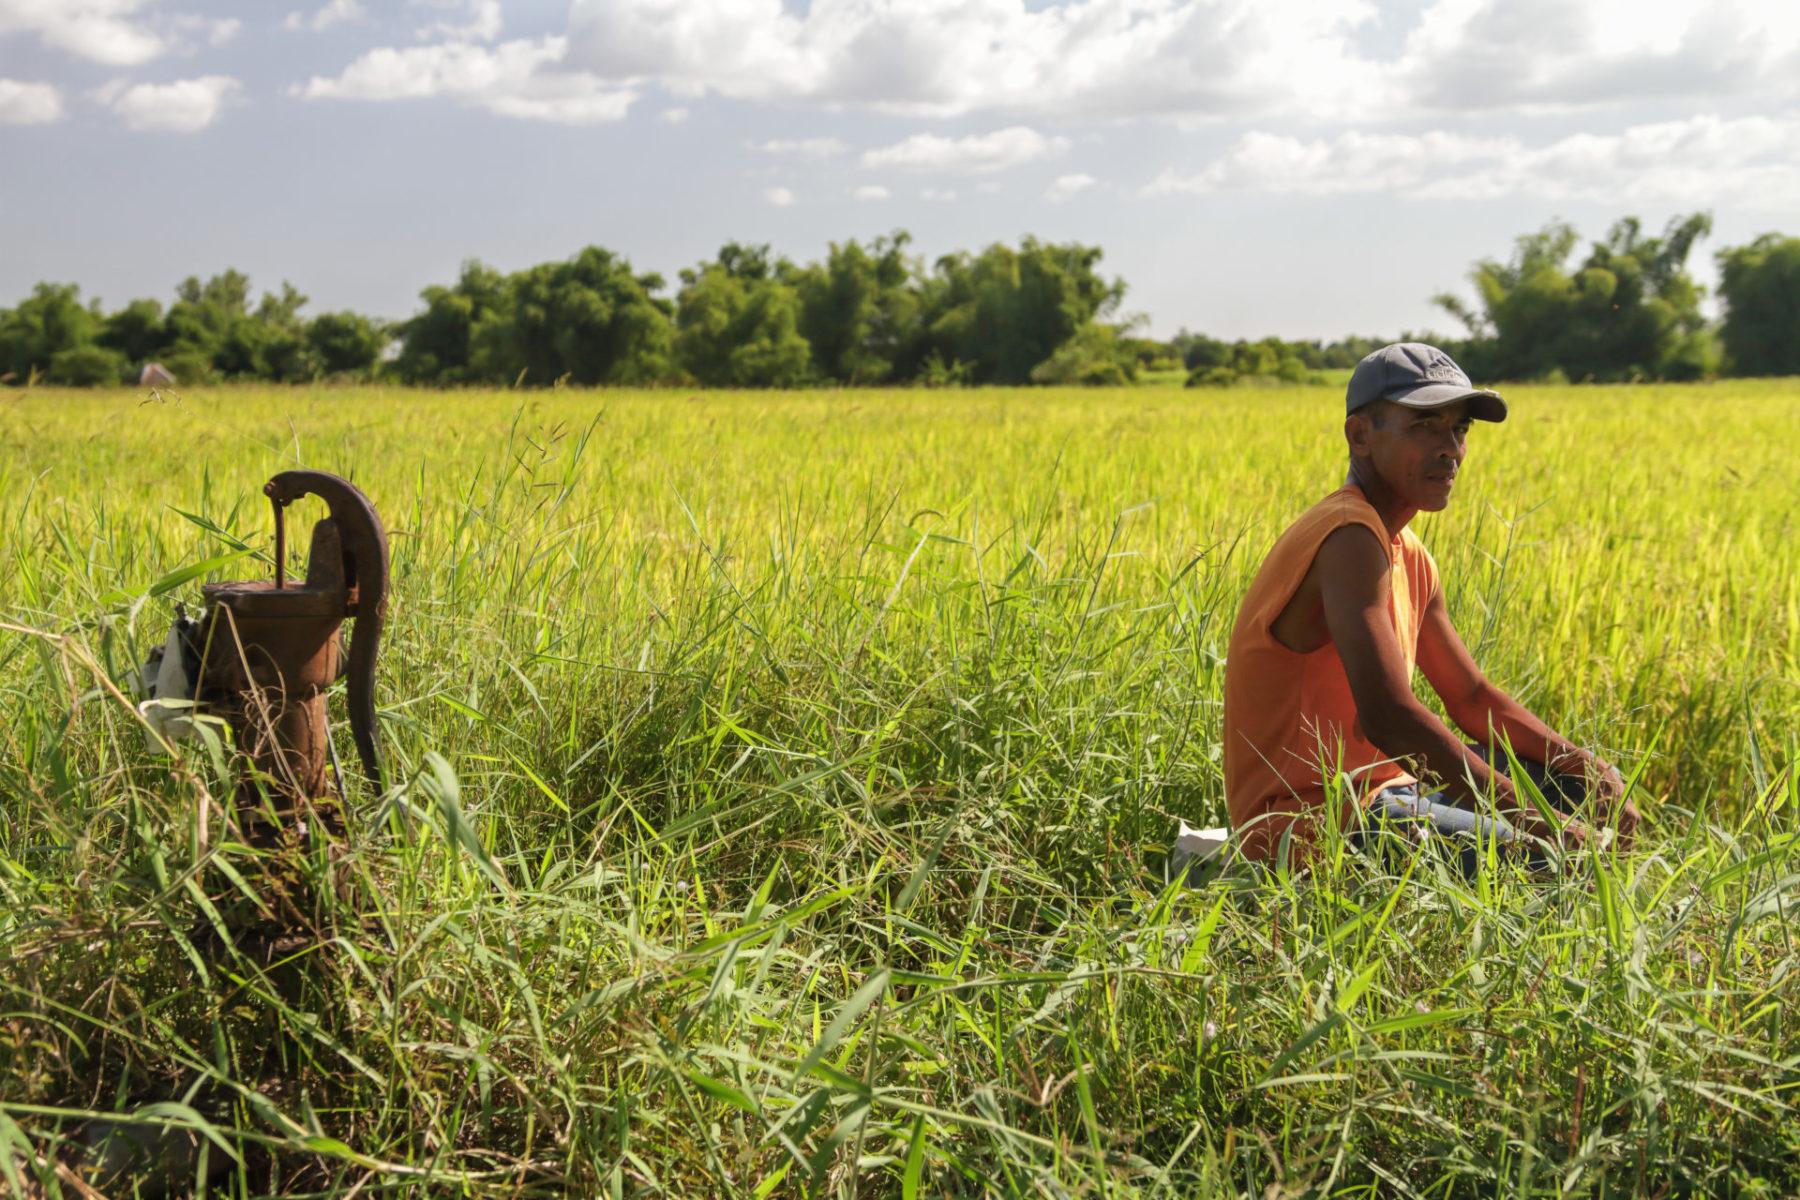 Philippinen Reisanbau Bäuer*innen